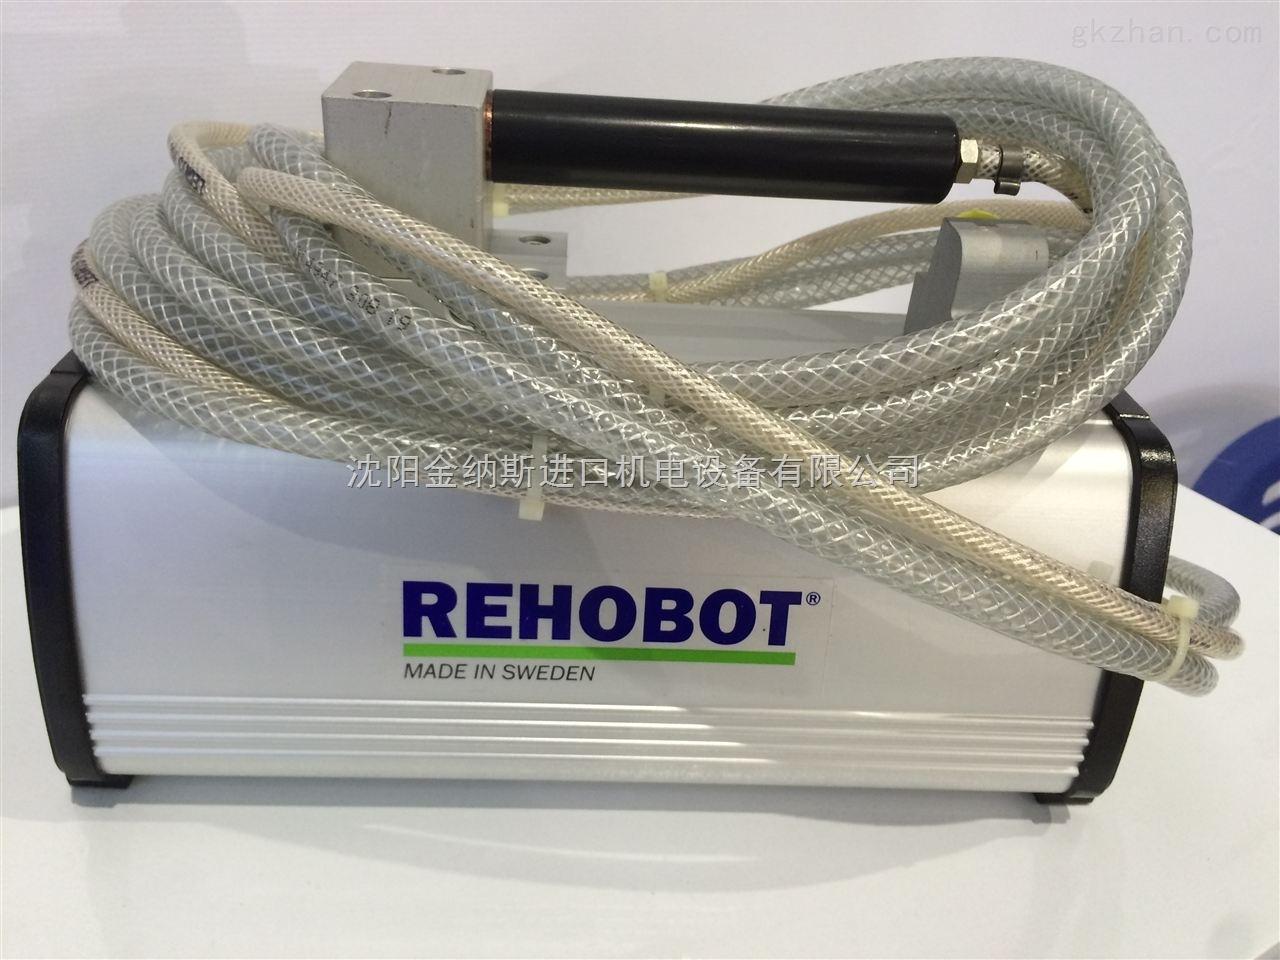 rehobotphs280-2400l